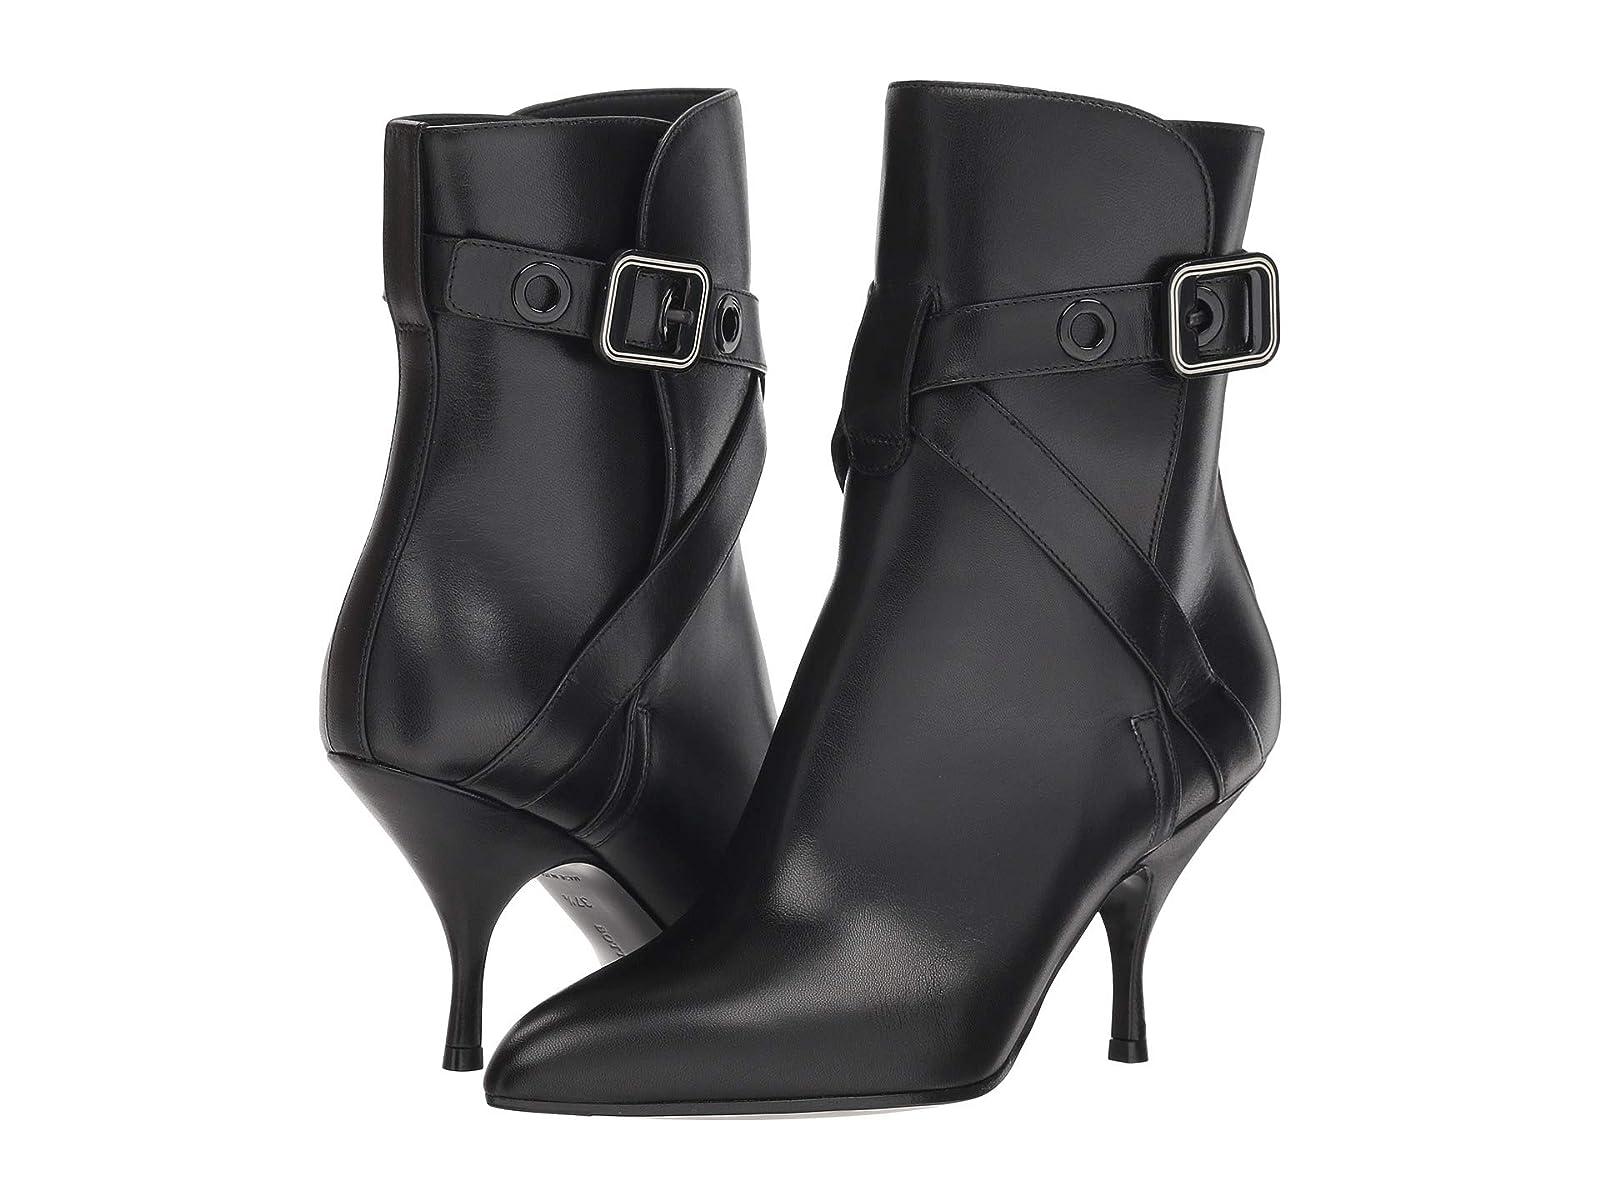 Bottega Veneta Strap BootieSelling fashionable and eye-catching shoes